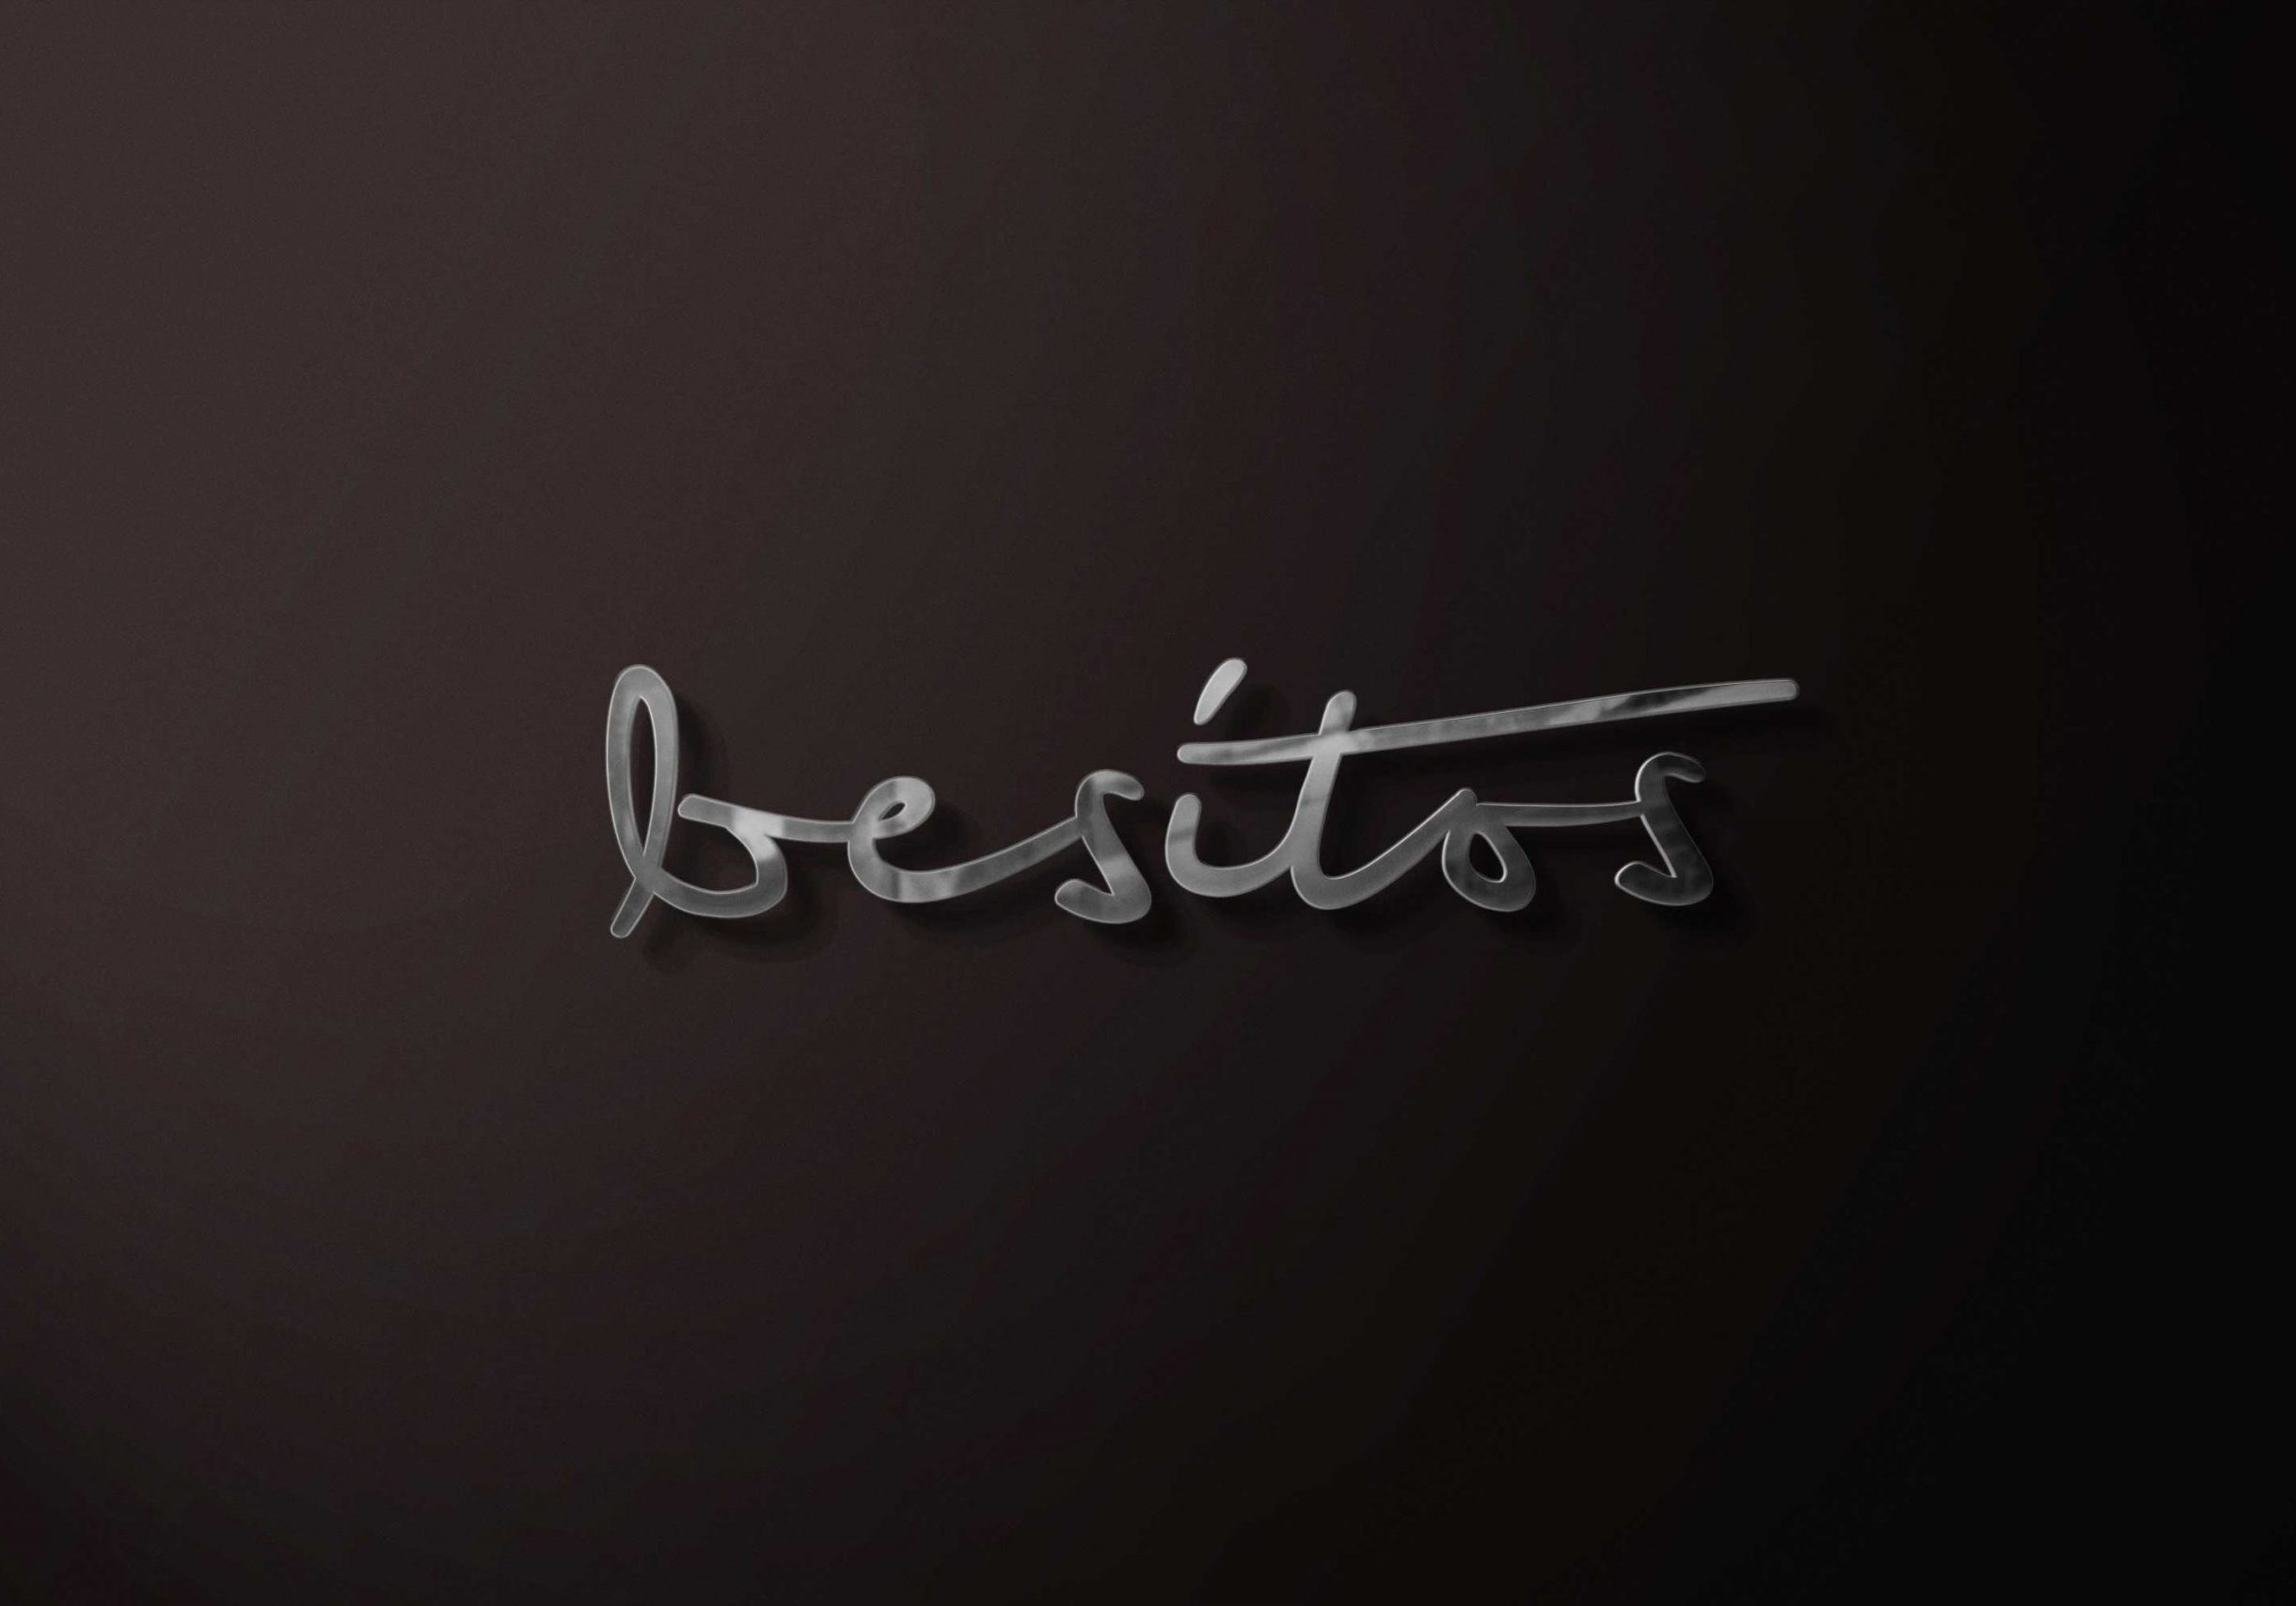 Besitos_Mockup_low